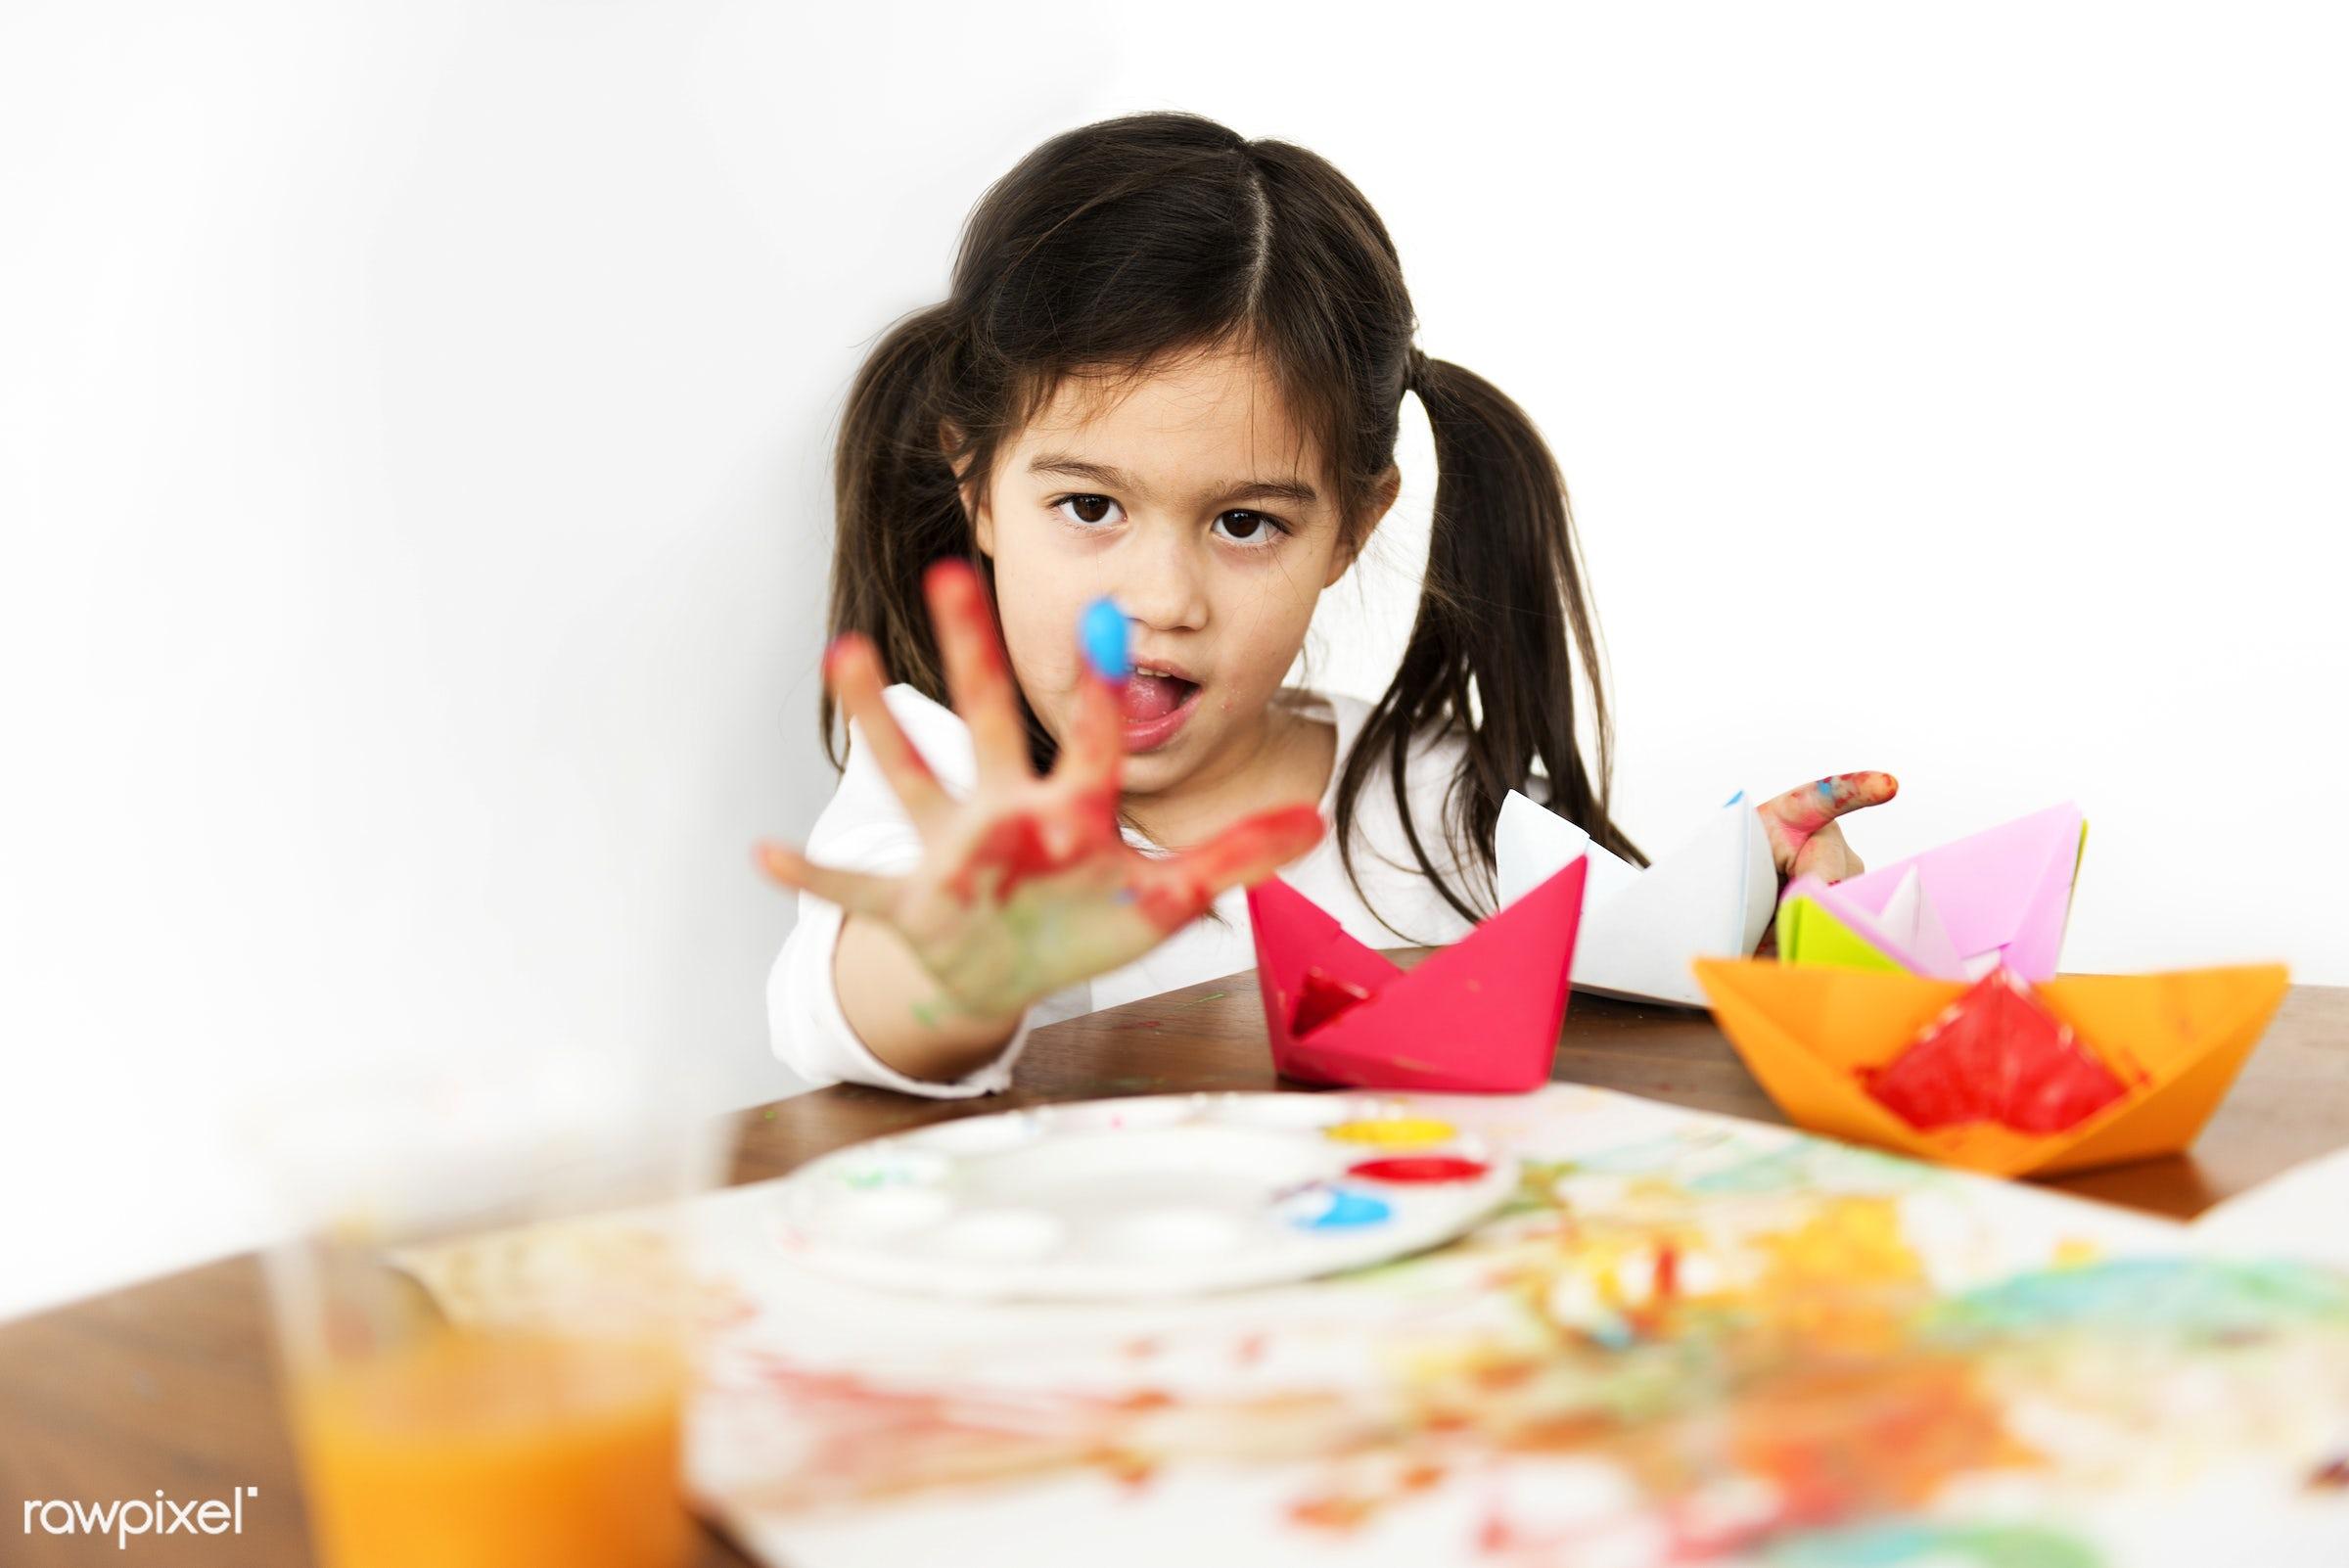 expression, creation, craft, little, be creative, imagination, artwork, kid, child, girl, style, lifestyle, feminism, artist...